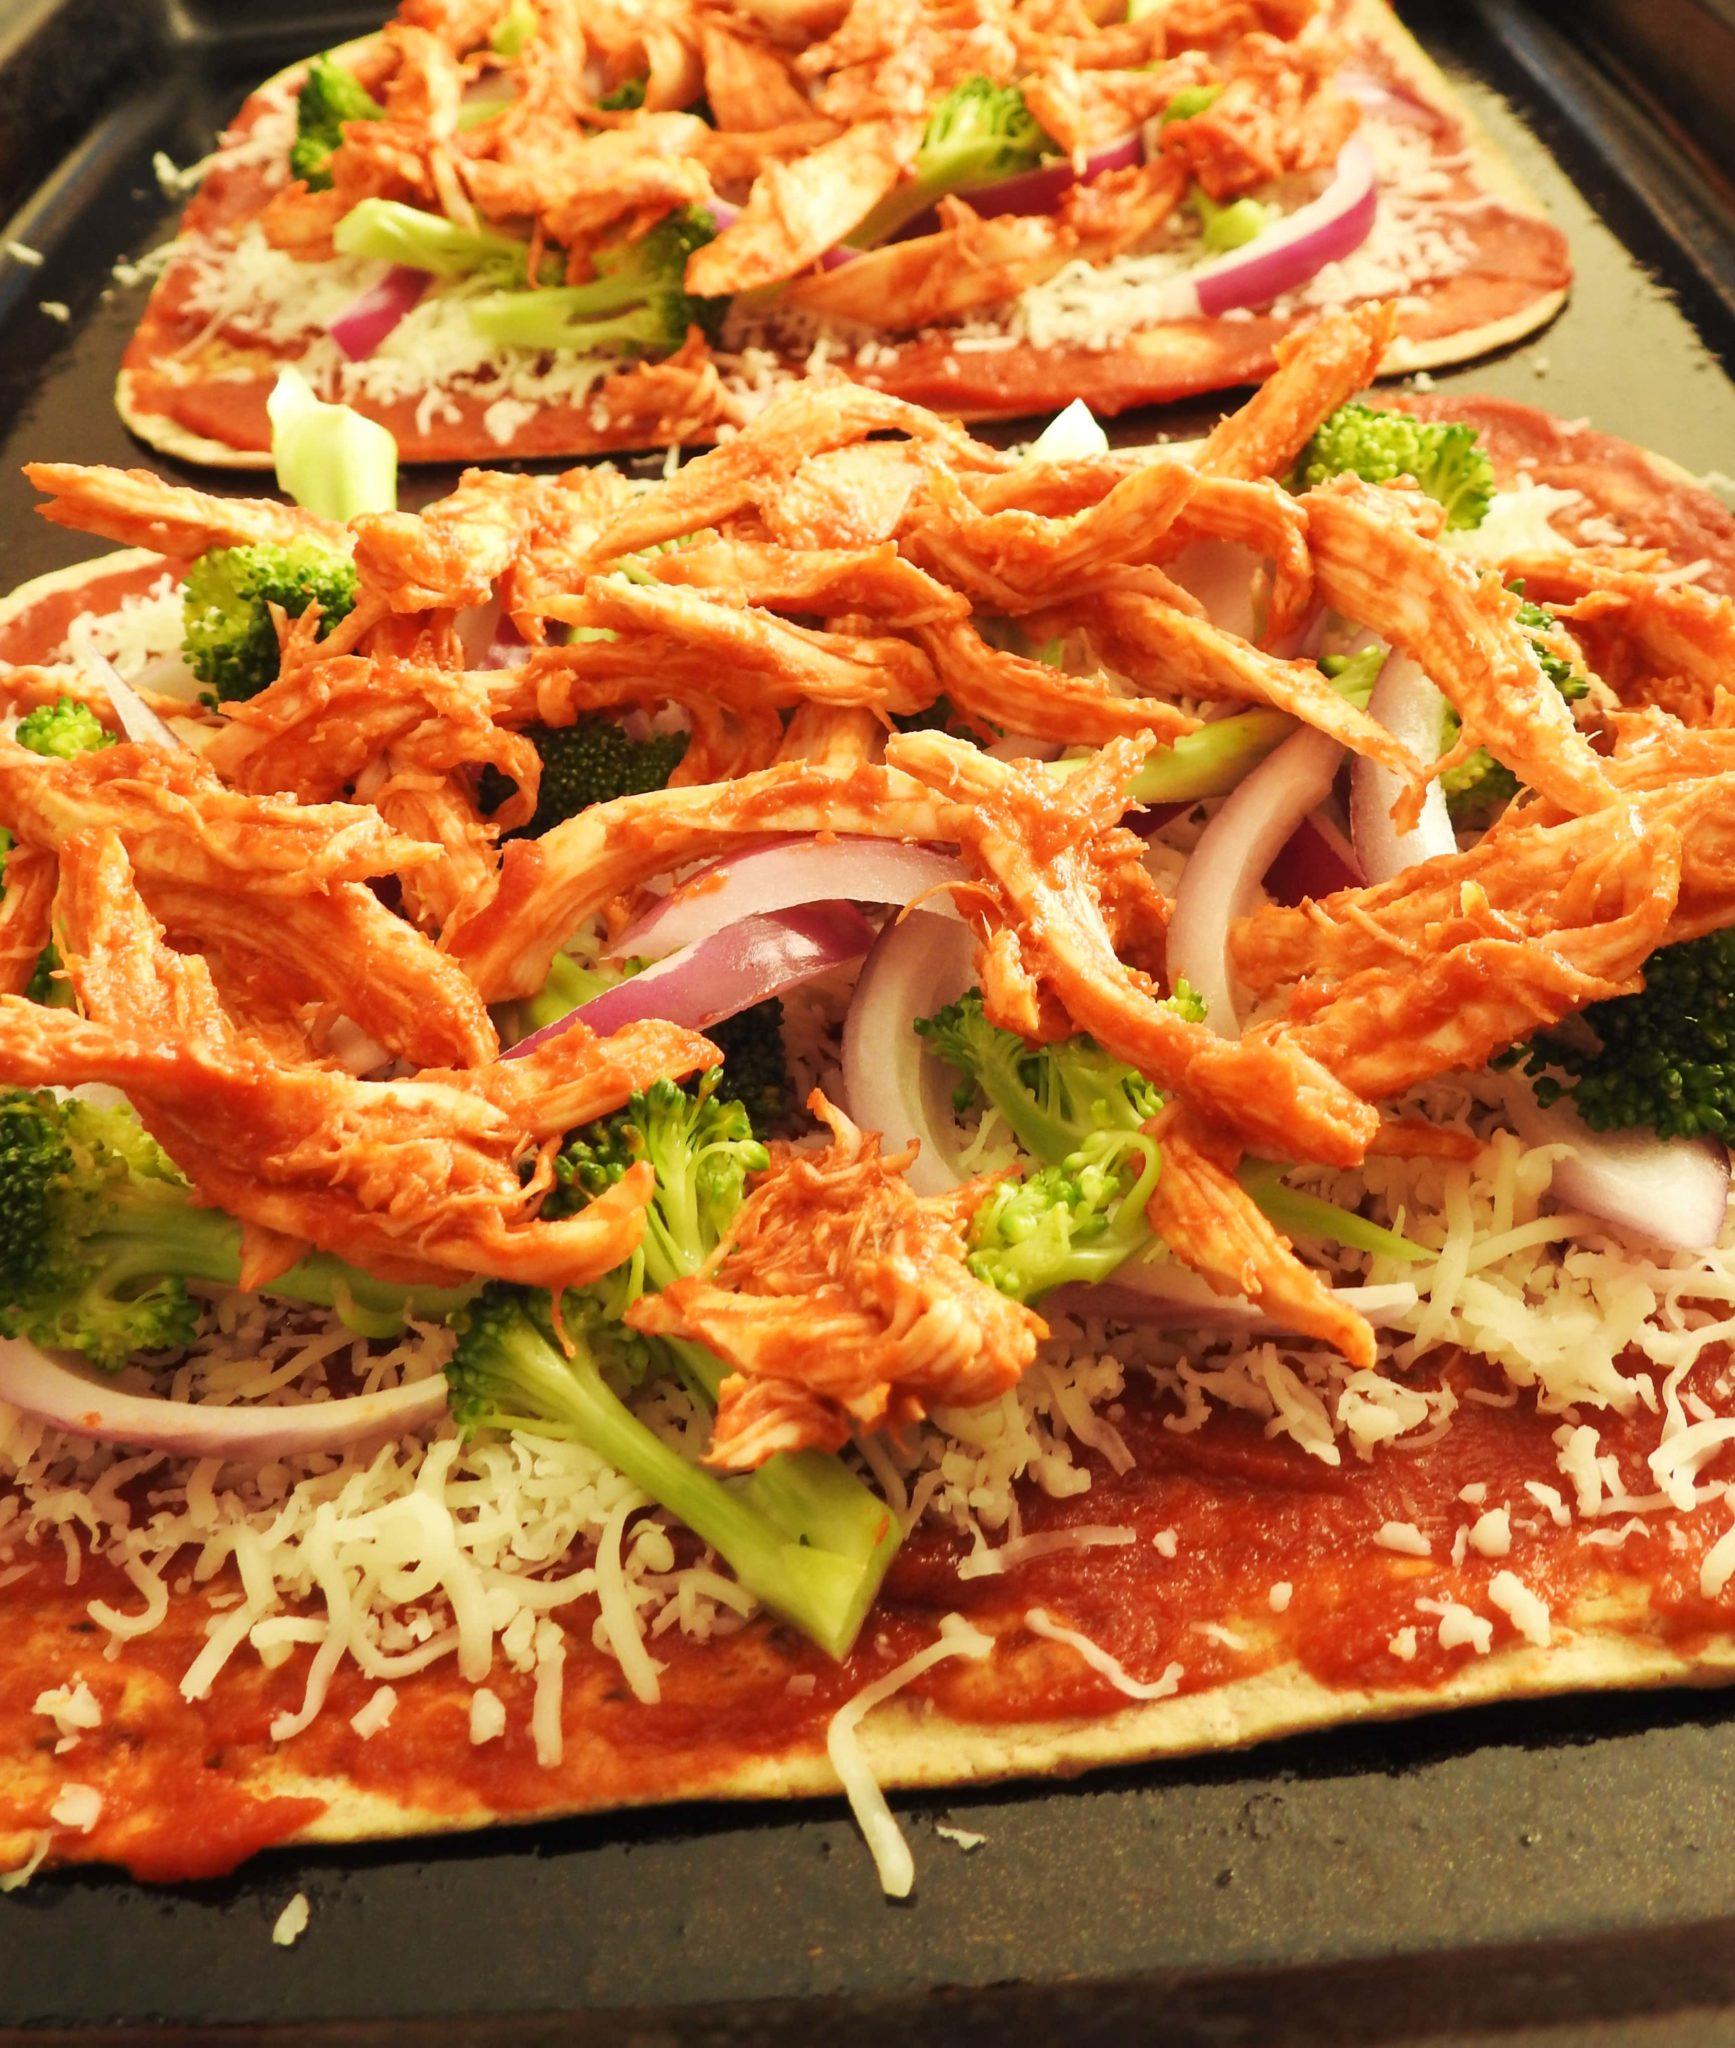 Shredded Chicken Sriracha Flatbread